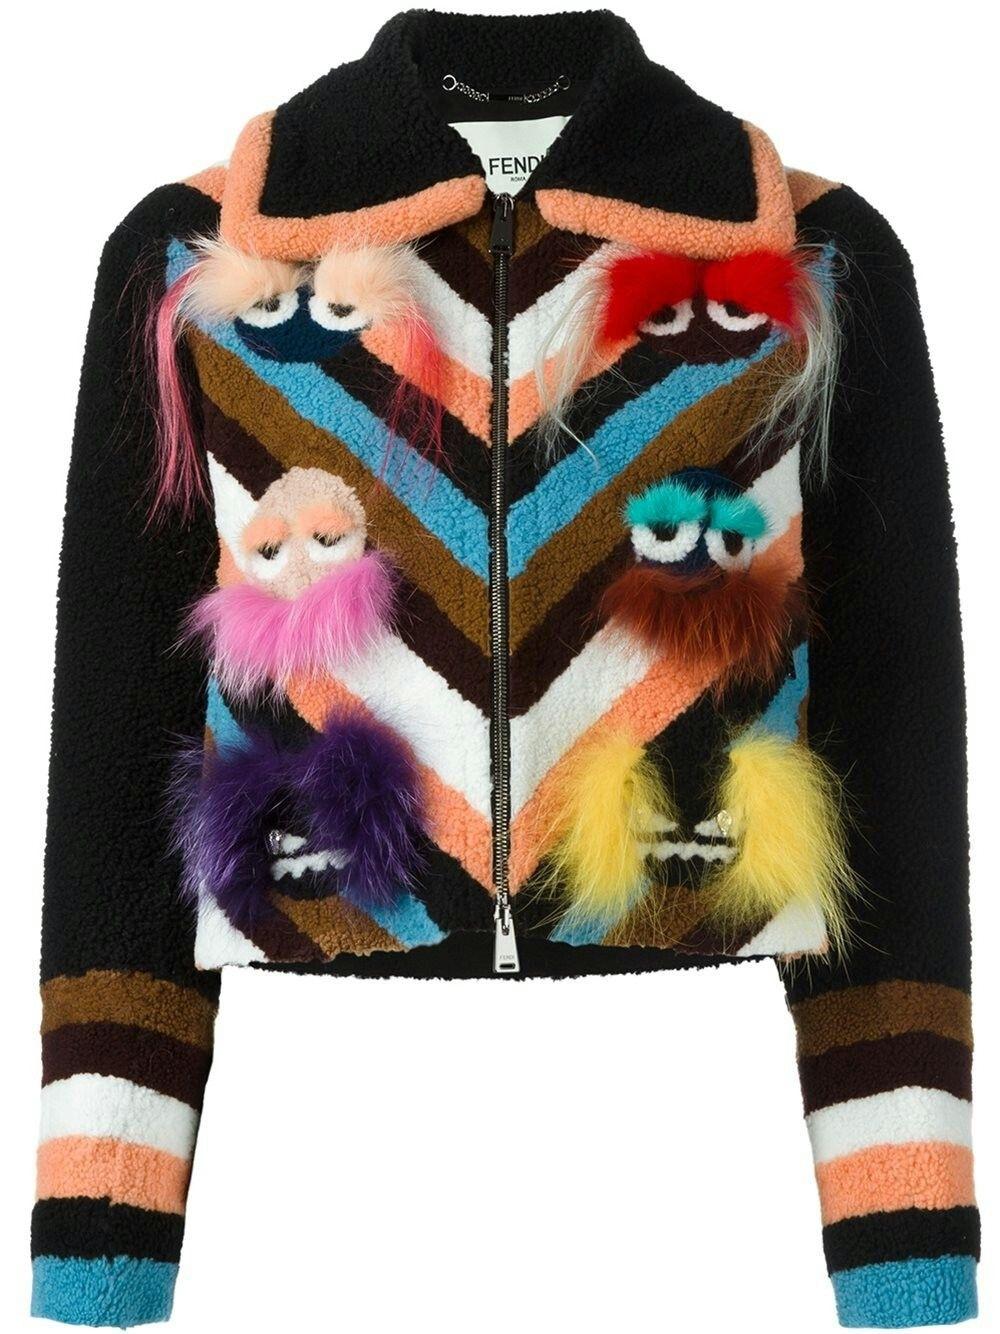 Pin by Le Caniche Noir on jackets   Pinterest   Jackets, Fendi bags ... 67d550f082c